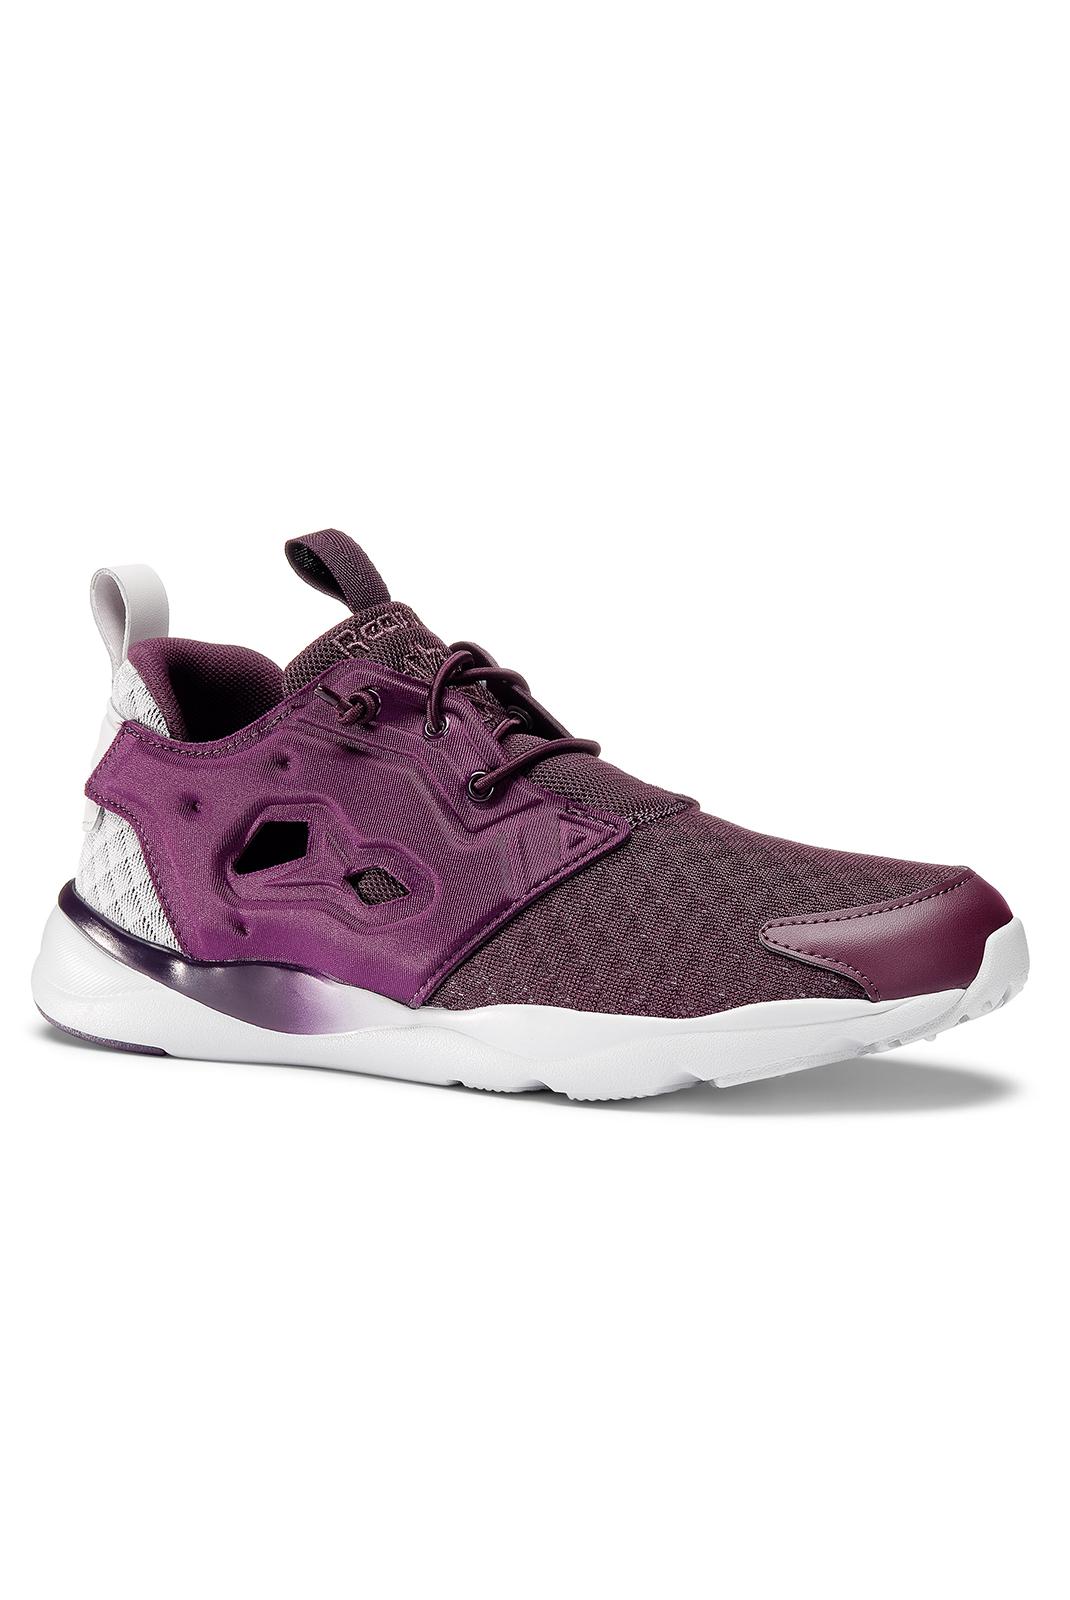 Baskets / Sneakers  Reebok V62123 FURYLITE ORCHID